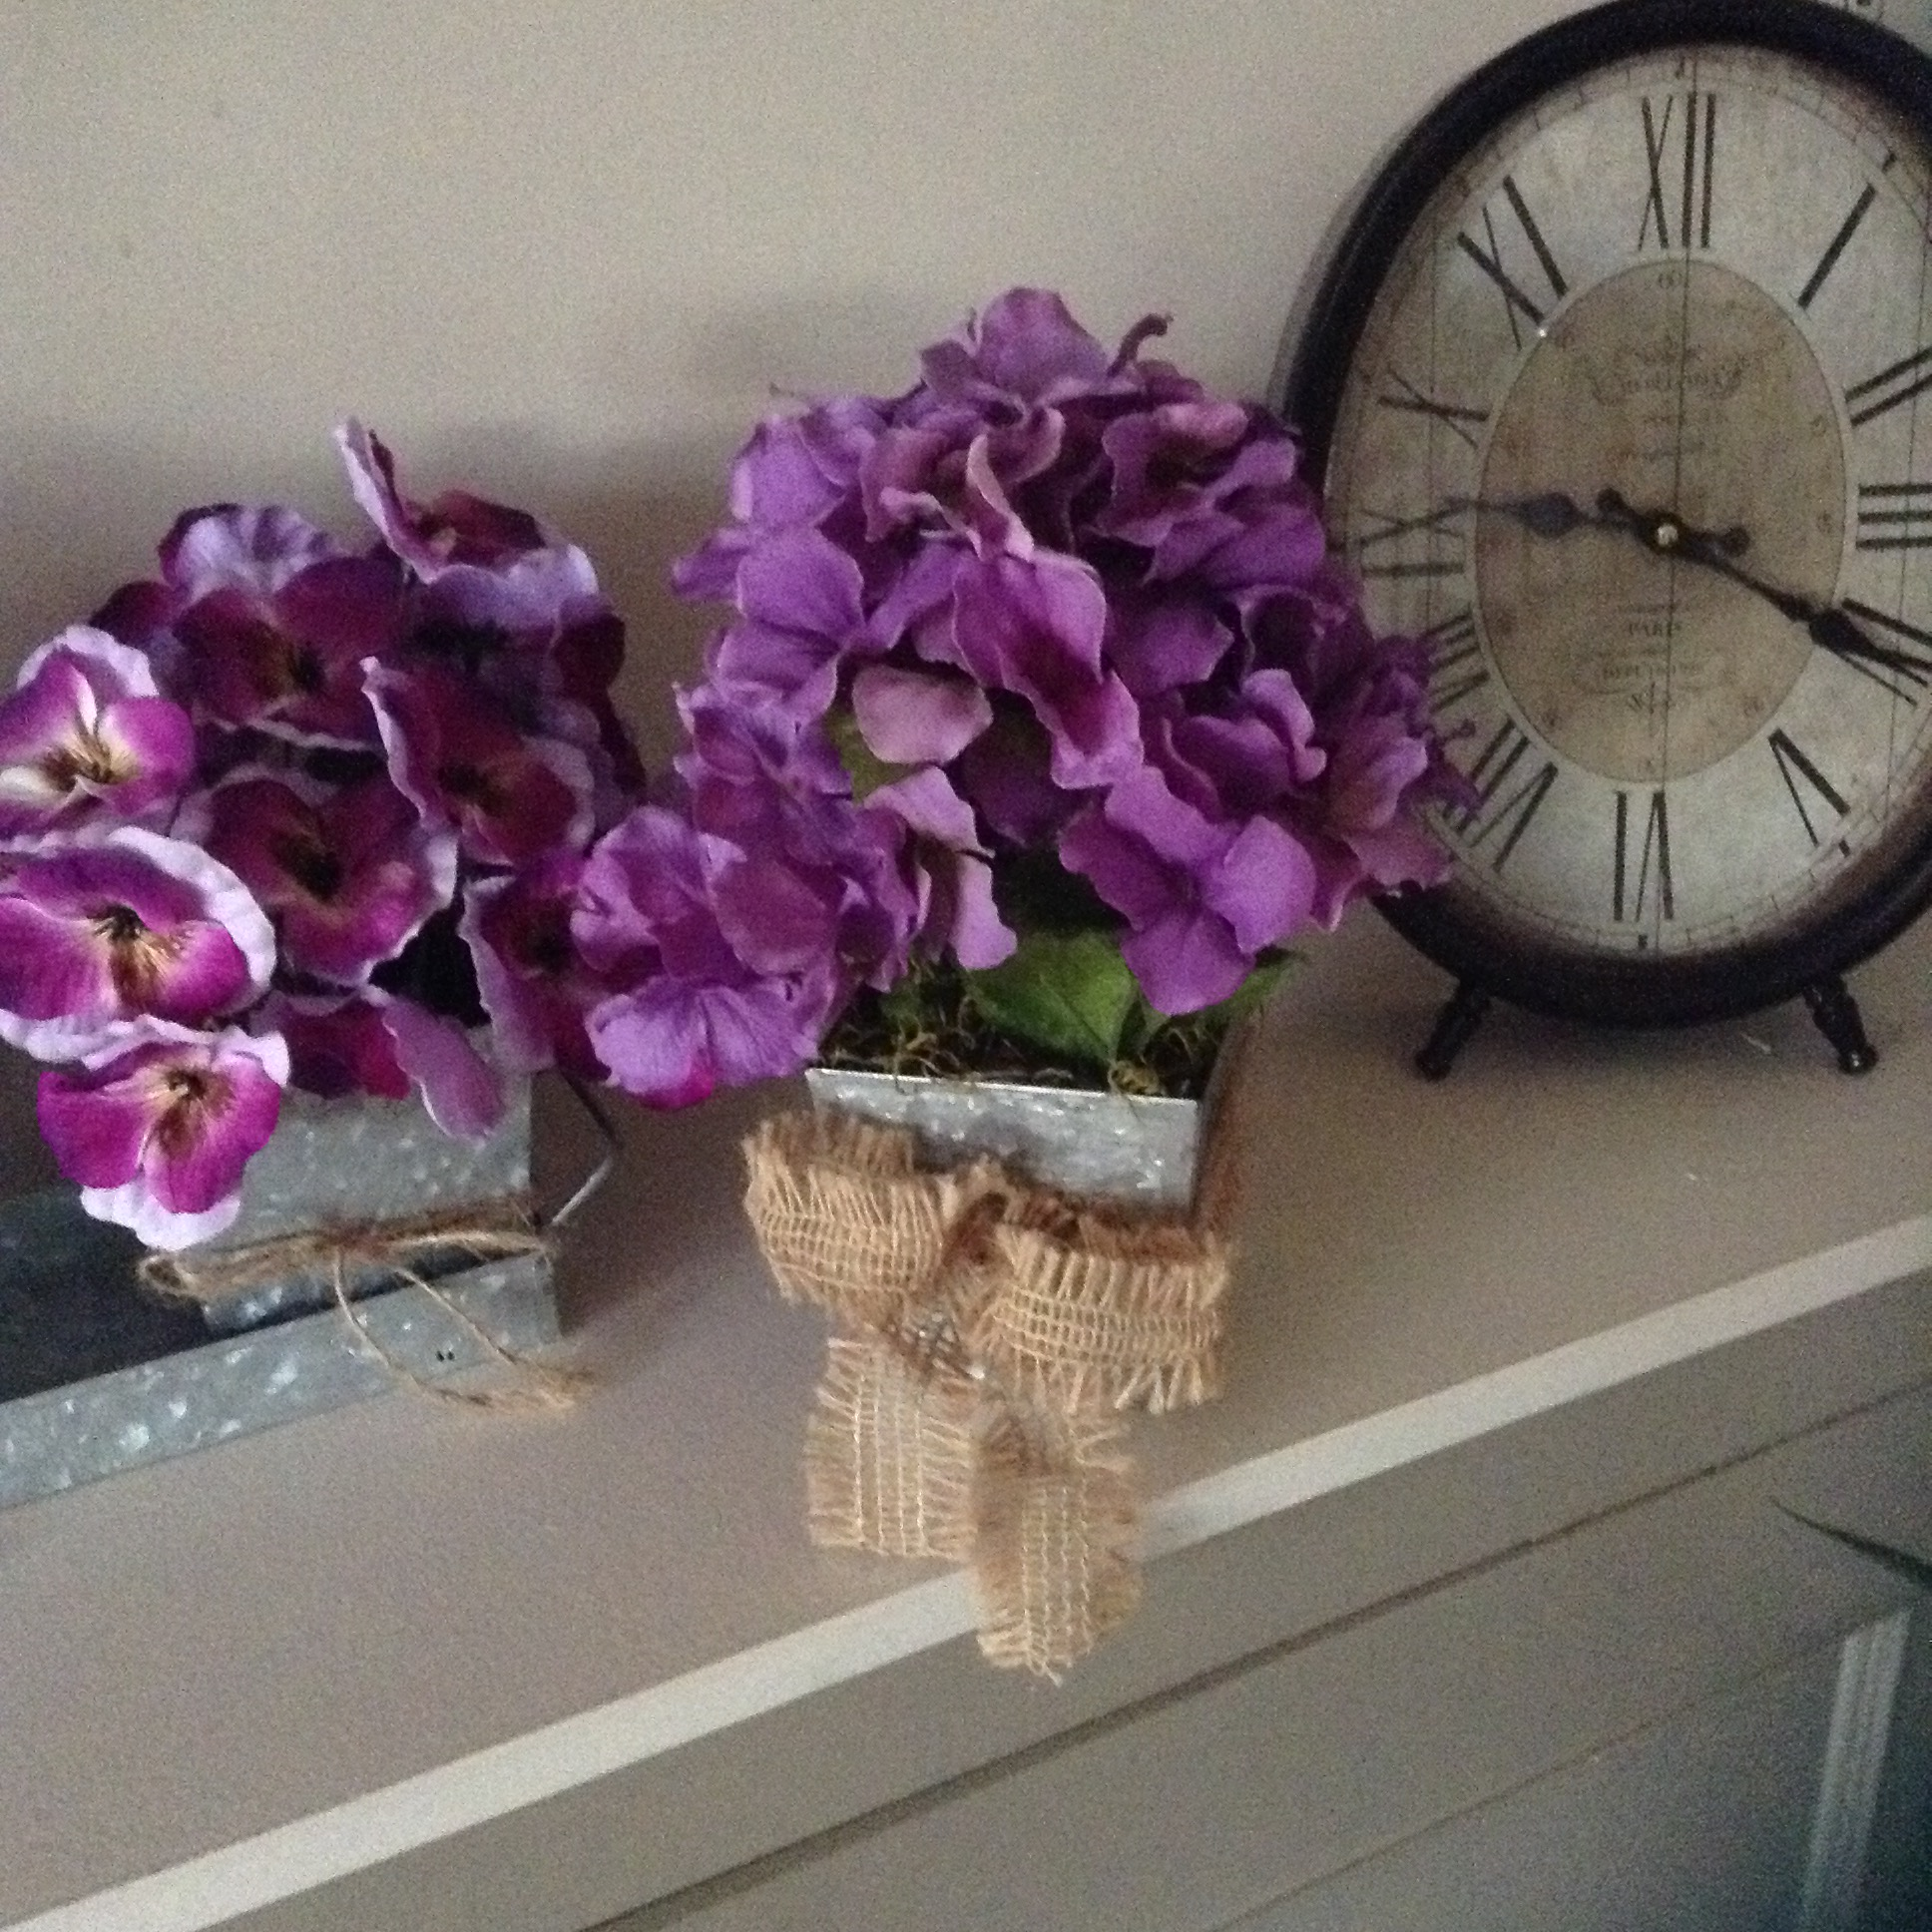 Sale floral centerpiece rustic pansies